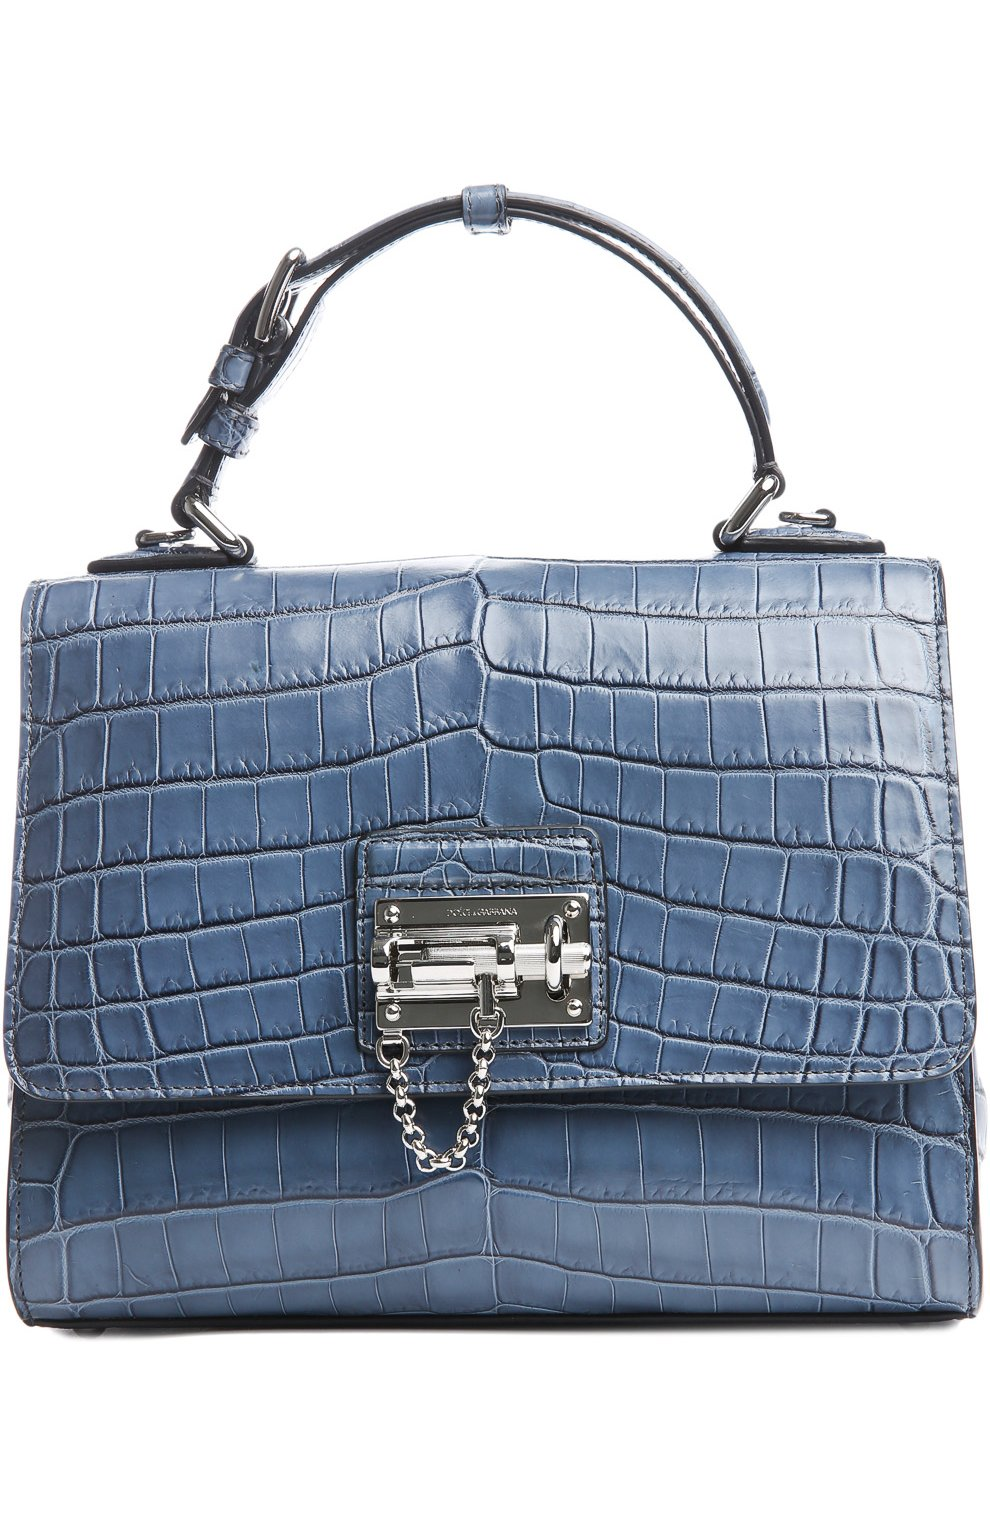 350bfcd699f3 Женская сумка monica из кожи крокодила DOLCE & GABBANA синяя цвета ...